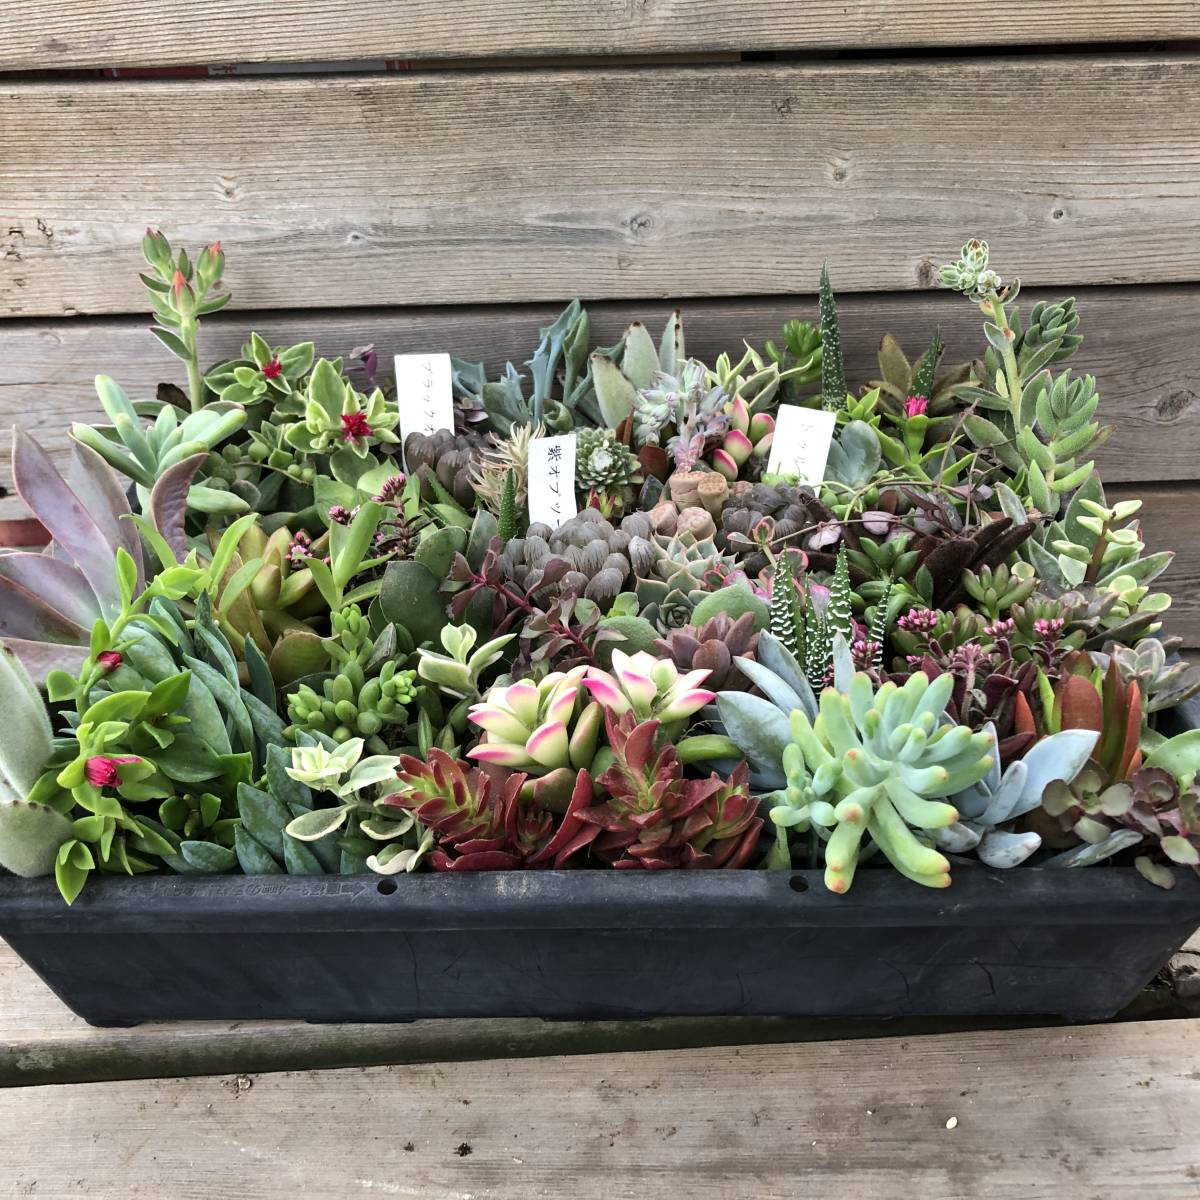 ■A-plants-r■ヤフオク初出品特価!多肉植物 ハオルチア3種&プラグ・カット苗 200ピースセット